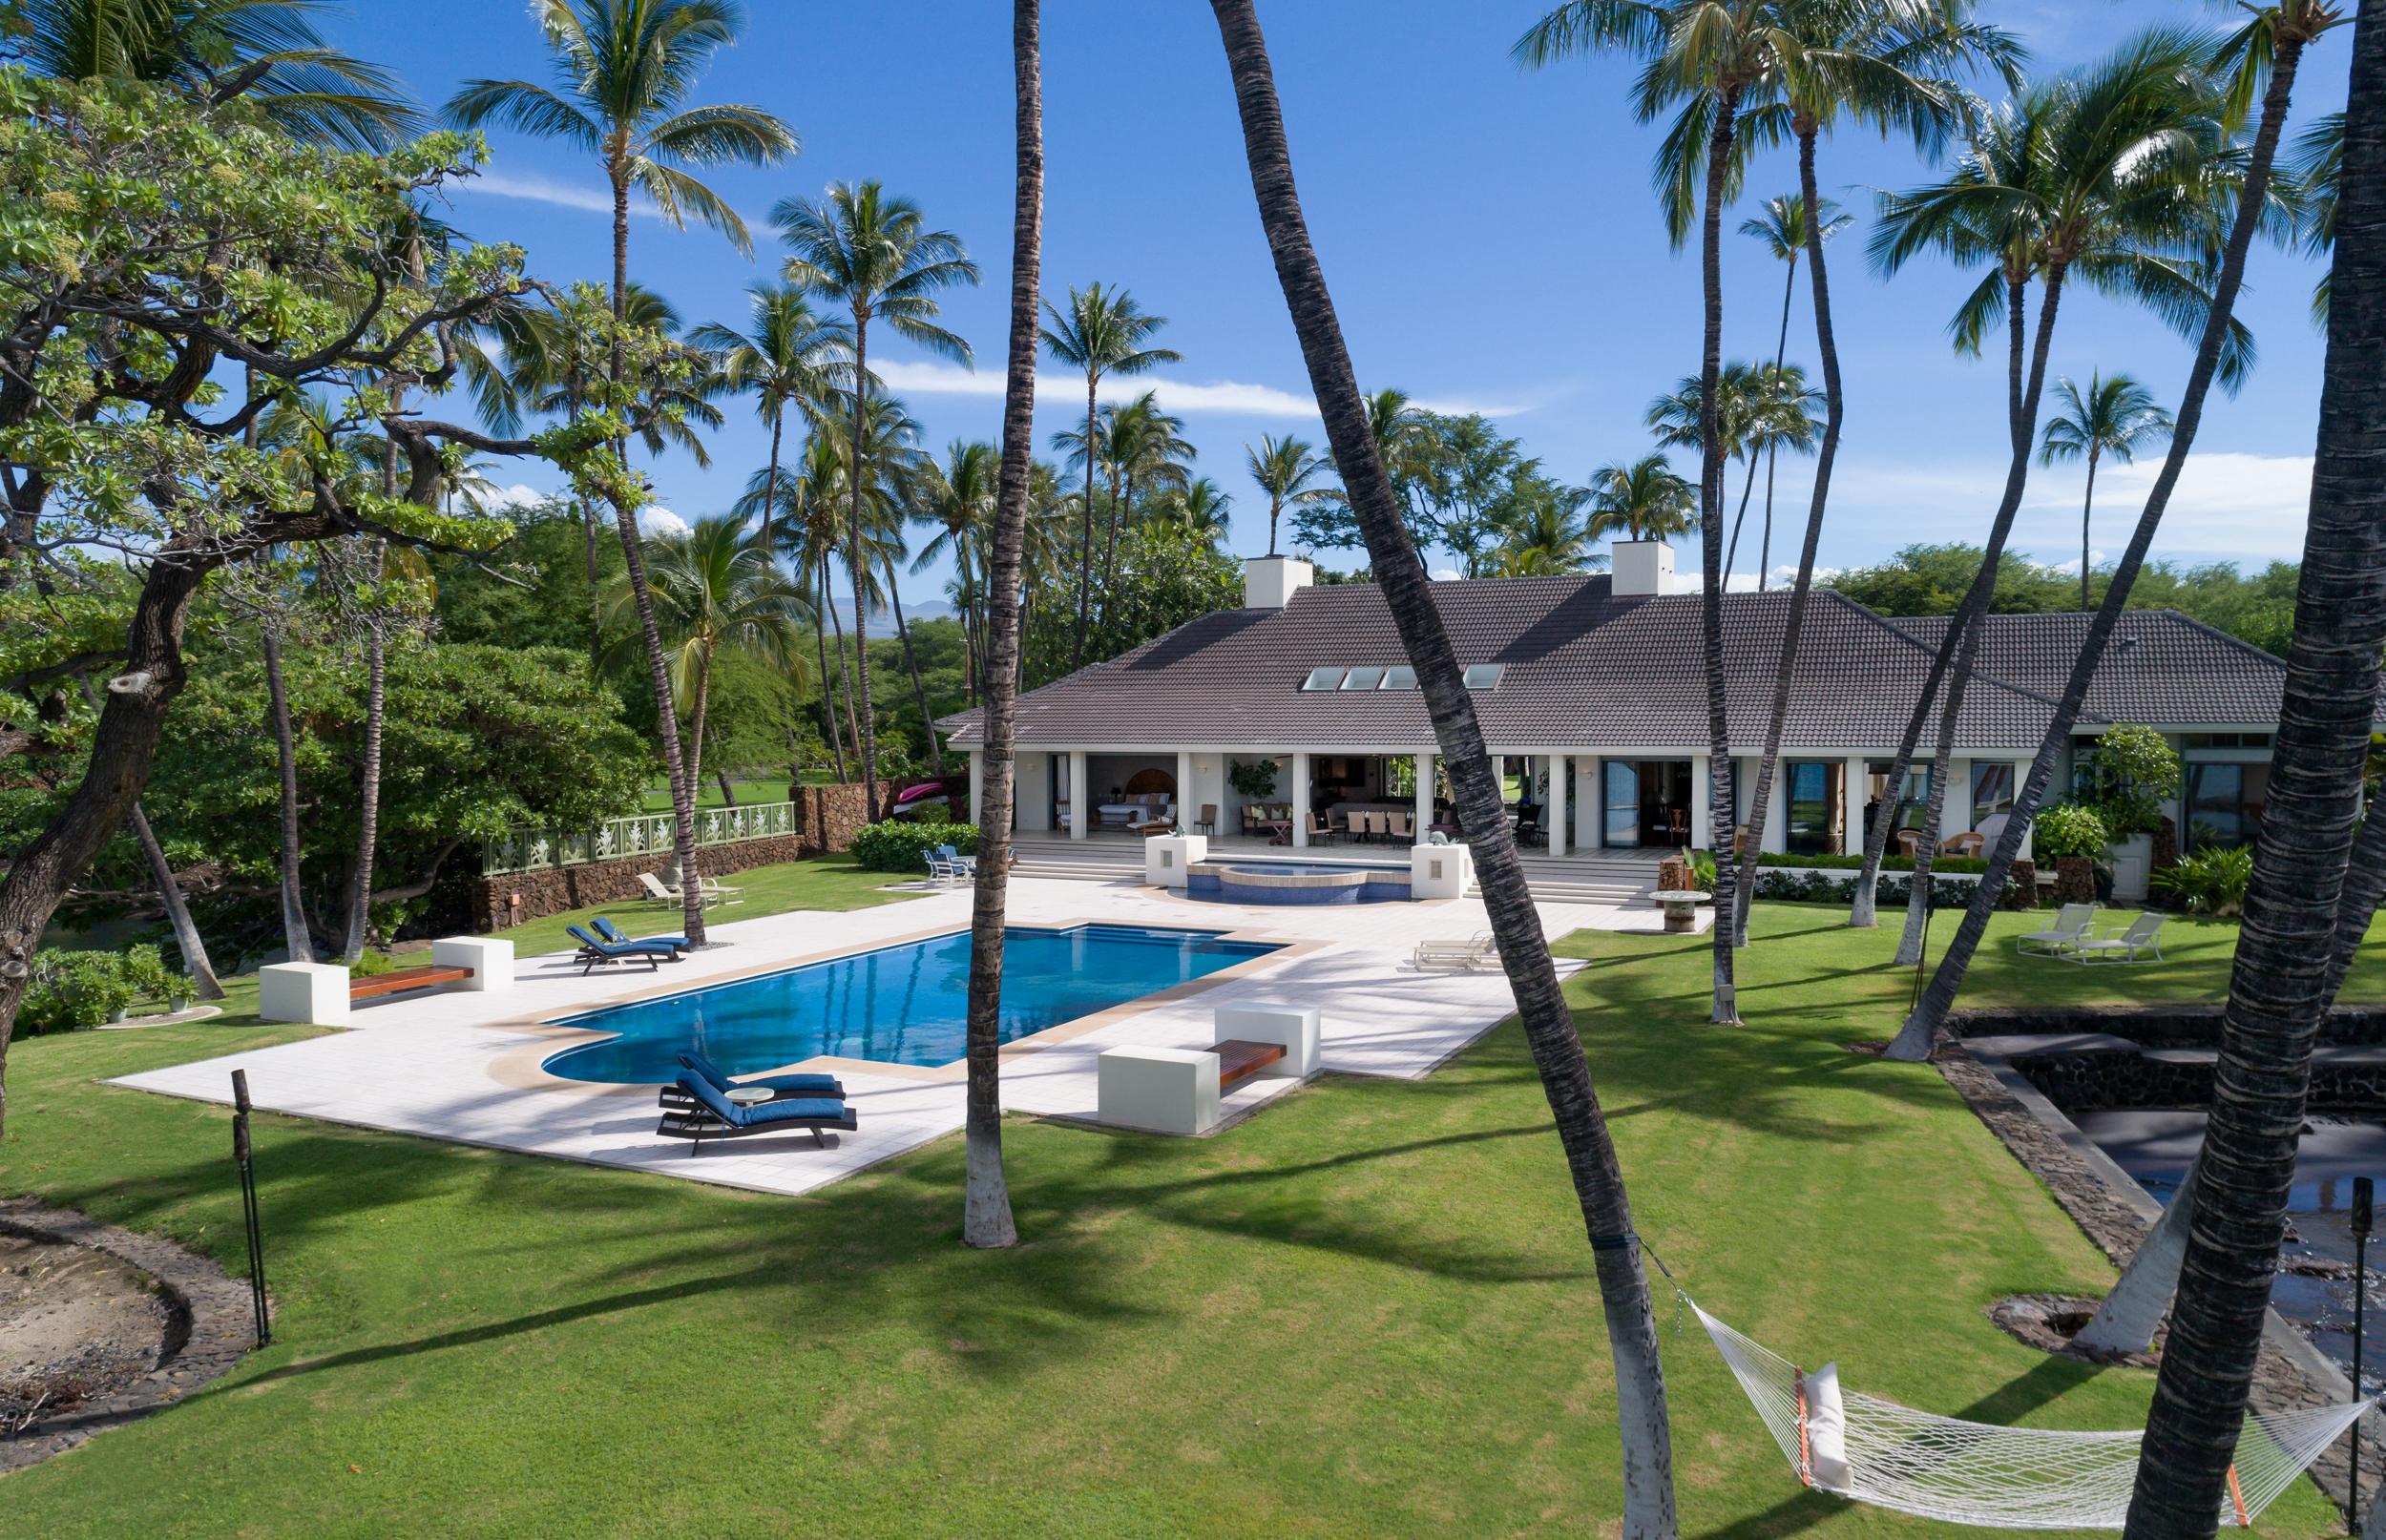 Honuala'i Estate is the epitome of gracious Hawaiian style. Honuala'i Estate | Puako | $17.499 million | 7,744 sq. ft. Interior | 6 BR / 7.5 BA + Office |  MLS#626730